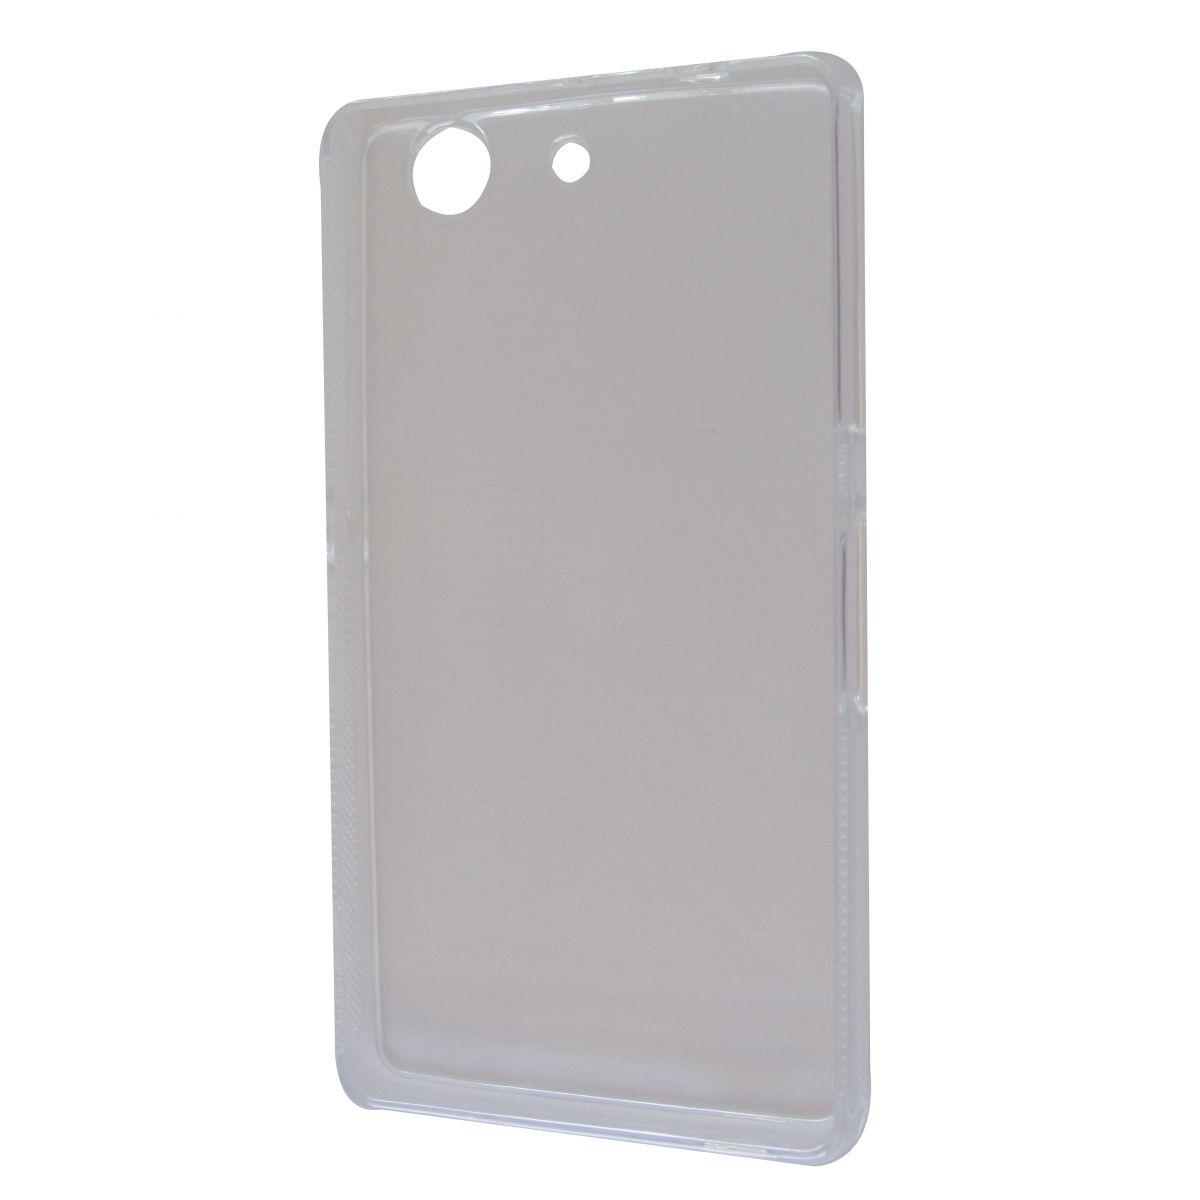 Capa TPU Transparente Sony Xperia Z3 Mini Compact D5803